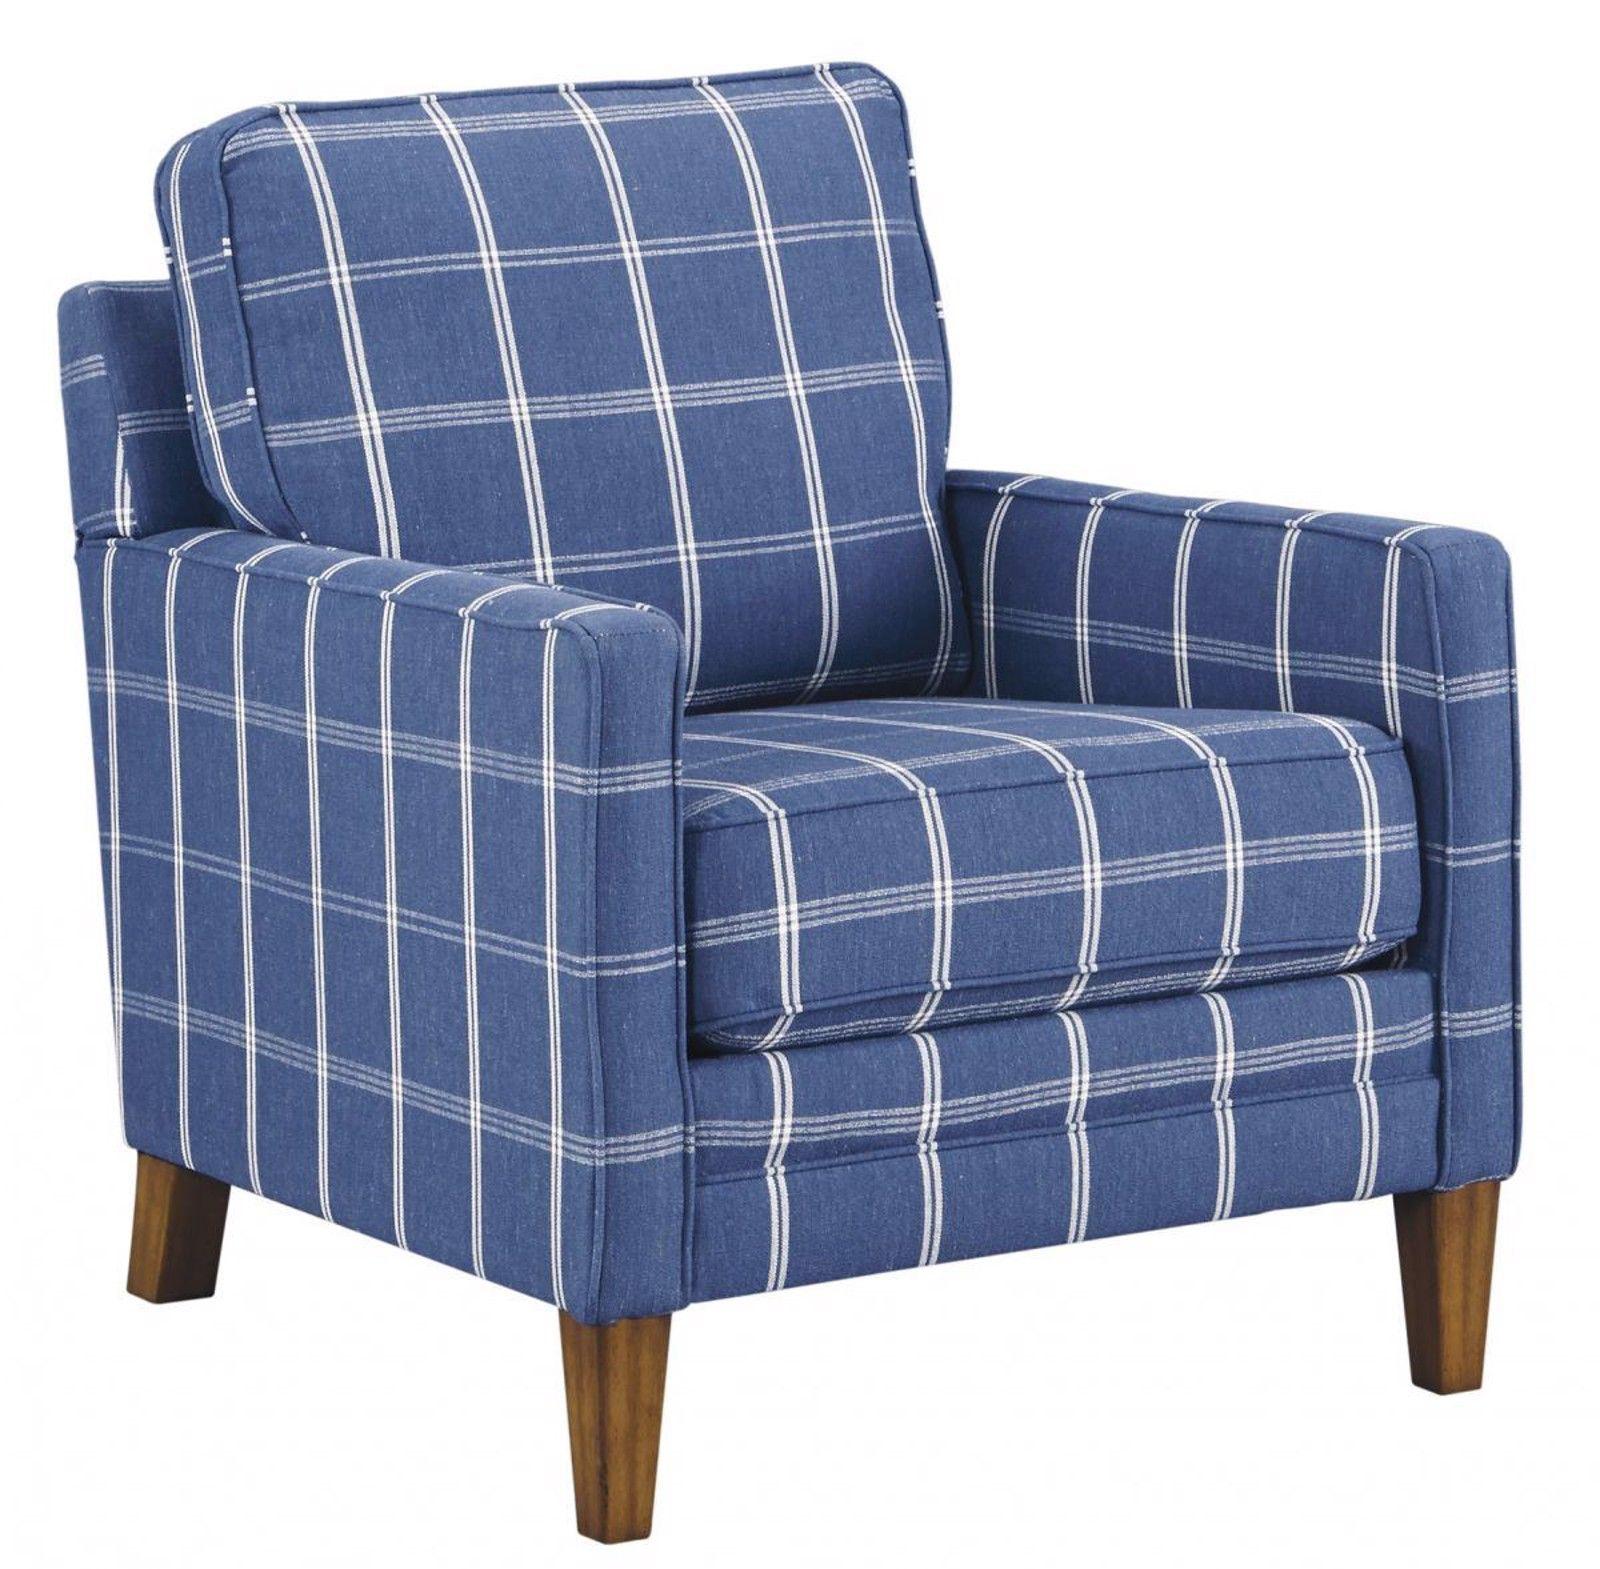 Best Adderbury Chair Furniture Home Decor Living Room Chairs 640 x 480